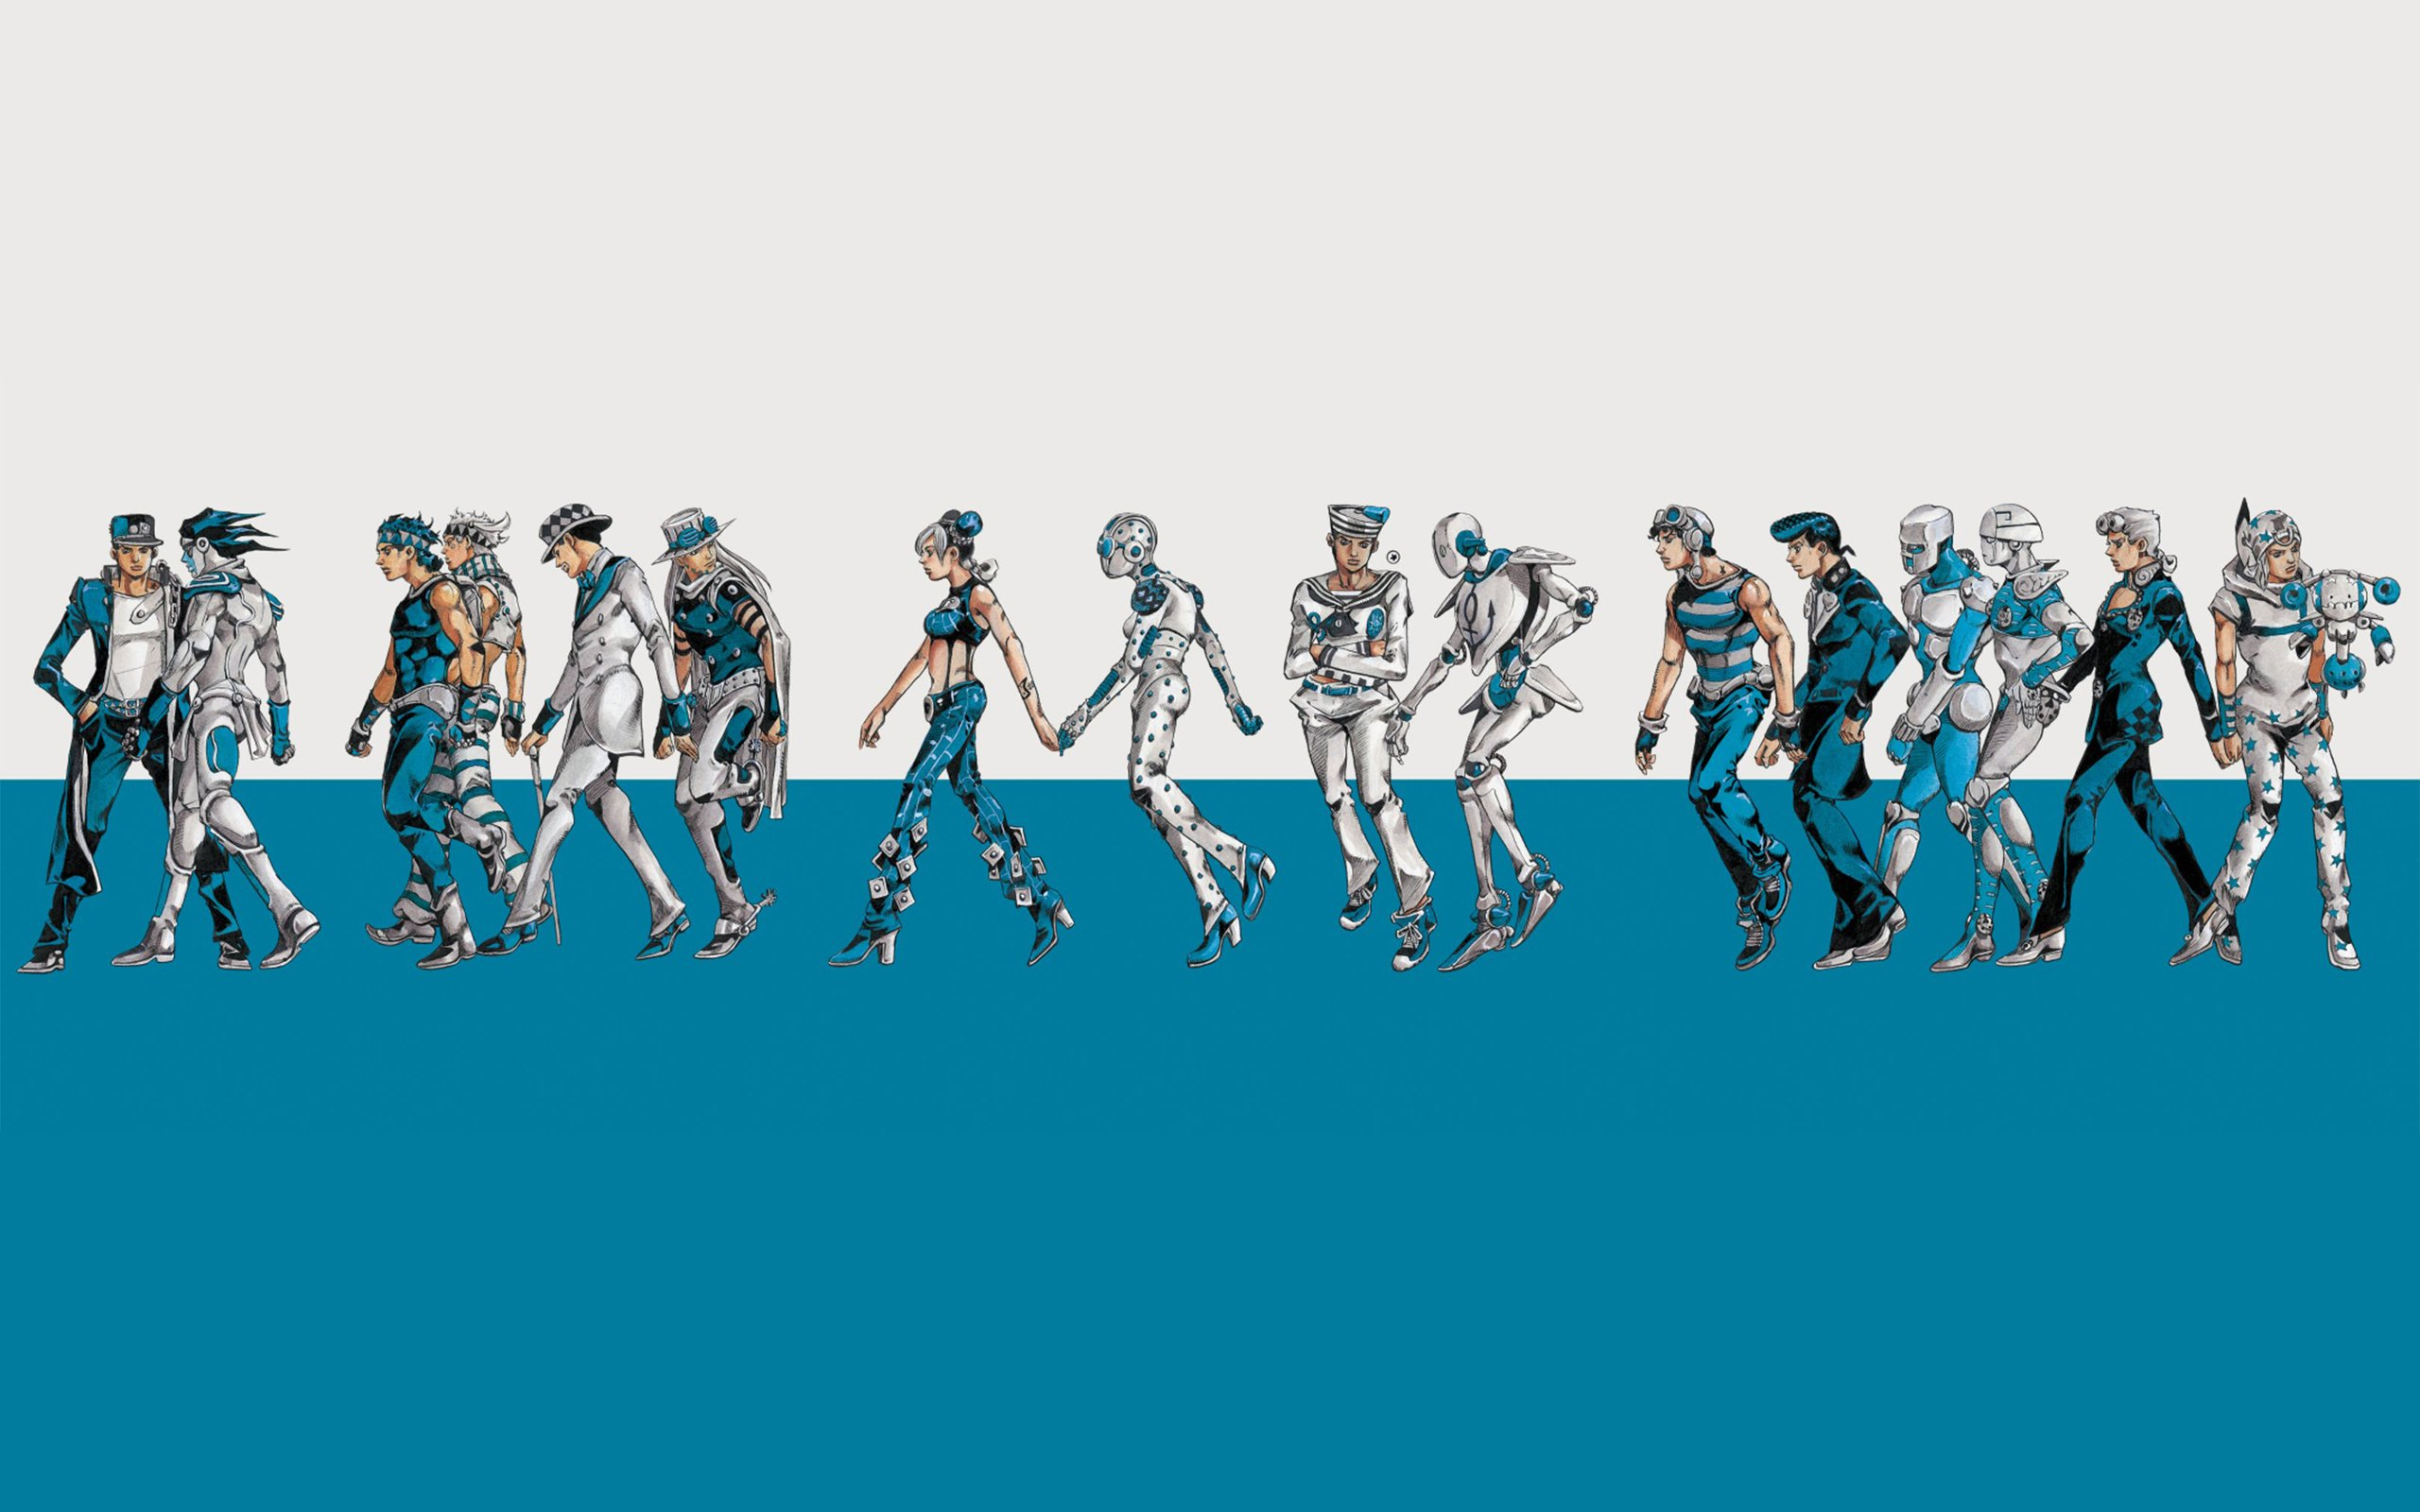 JoJo Wallpaper Dump Part 9 The One That Doesnt Exist Yet   Album 2560x1600